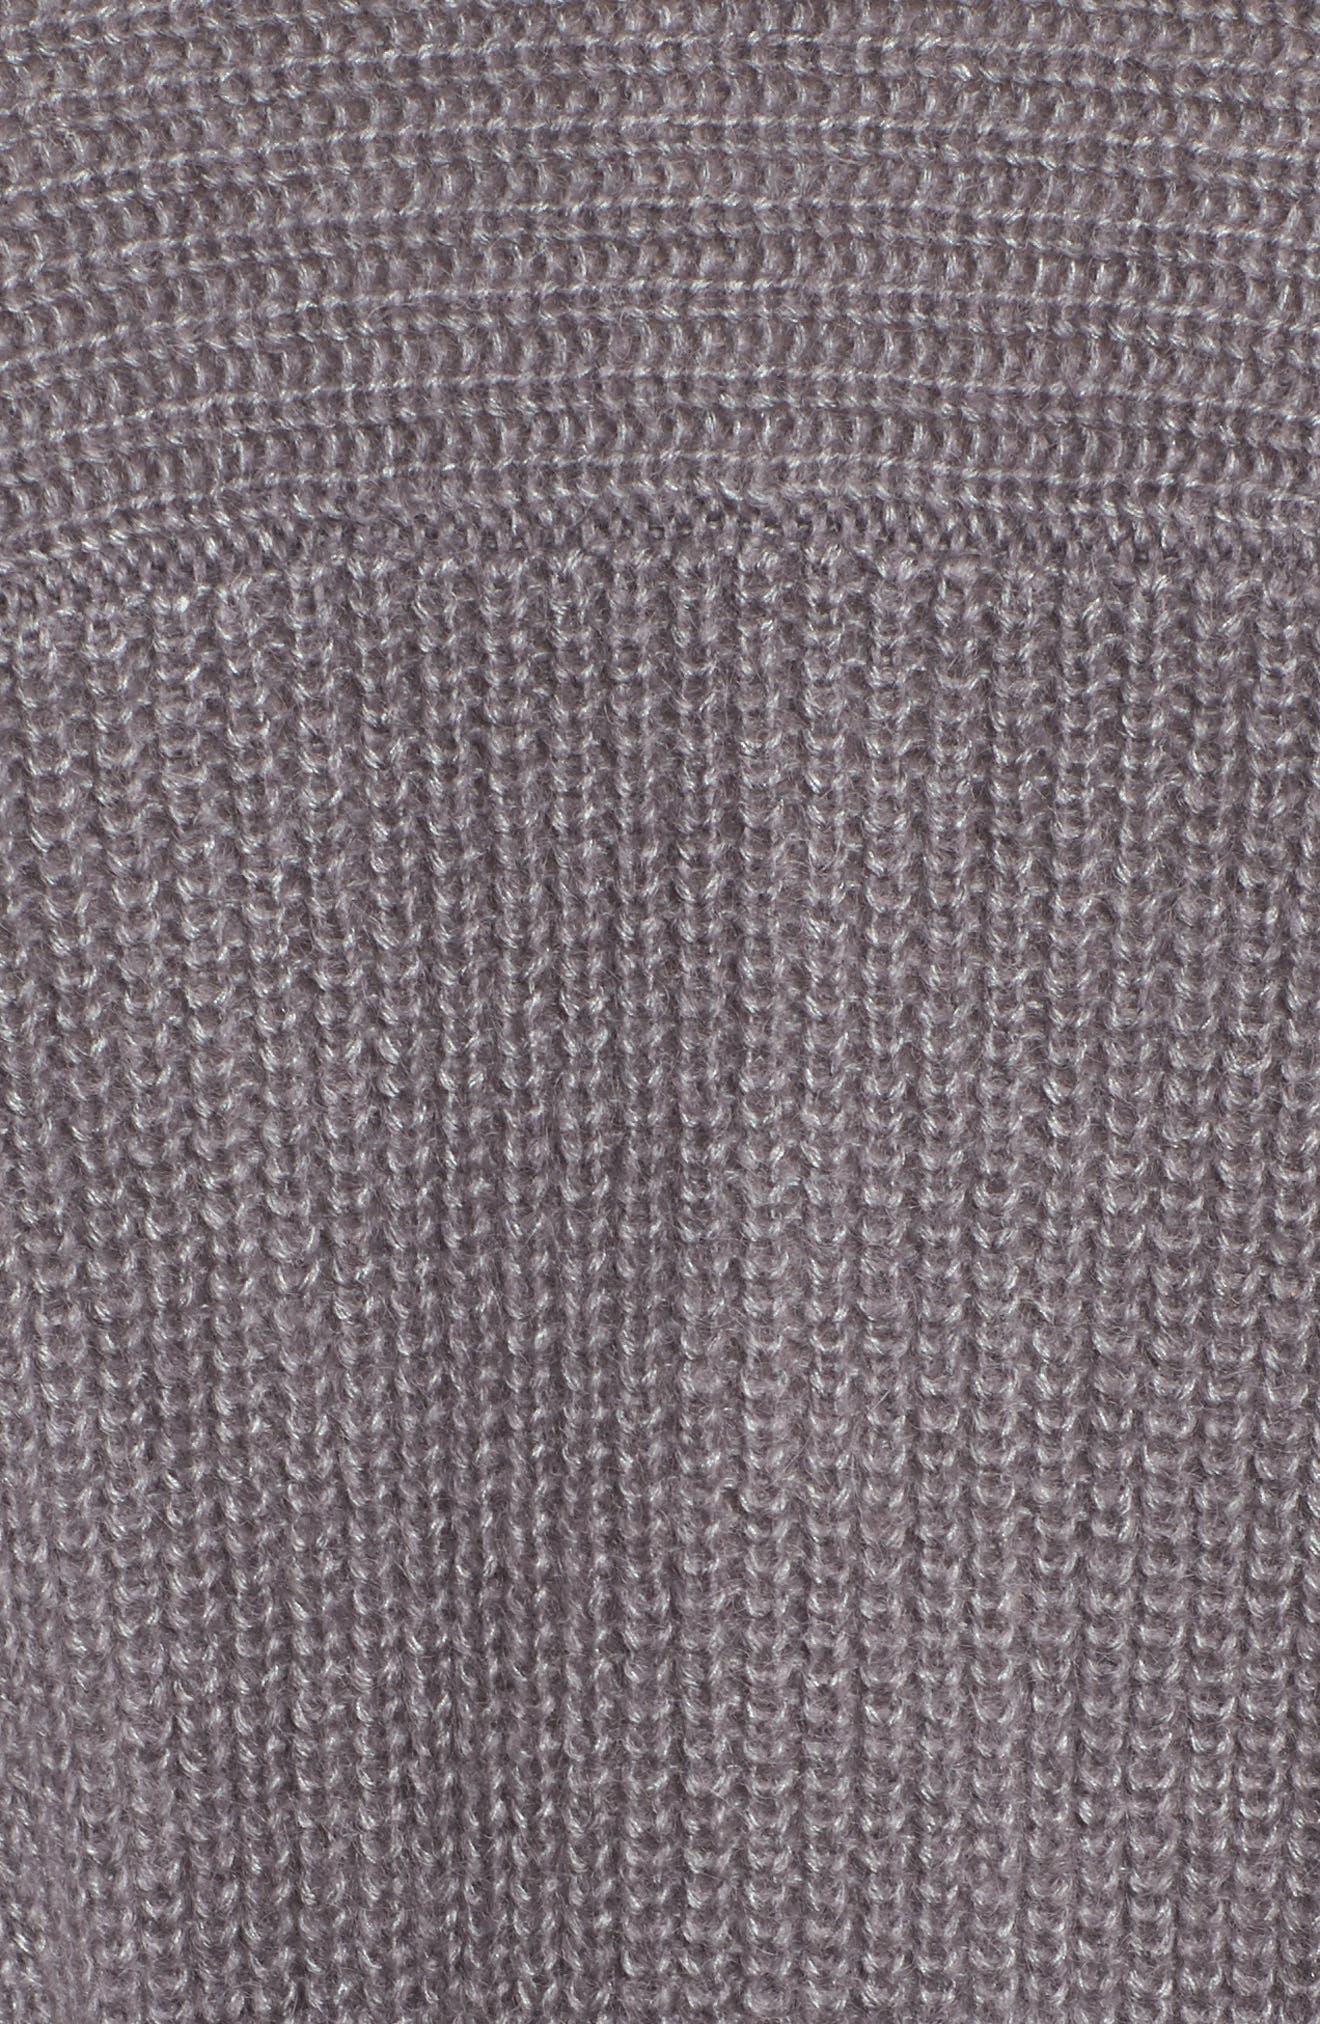 Lace-Up Back Cardigan,                             Alternate thumbnail 5, color,                             021